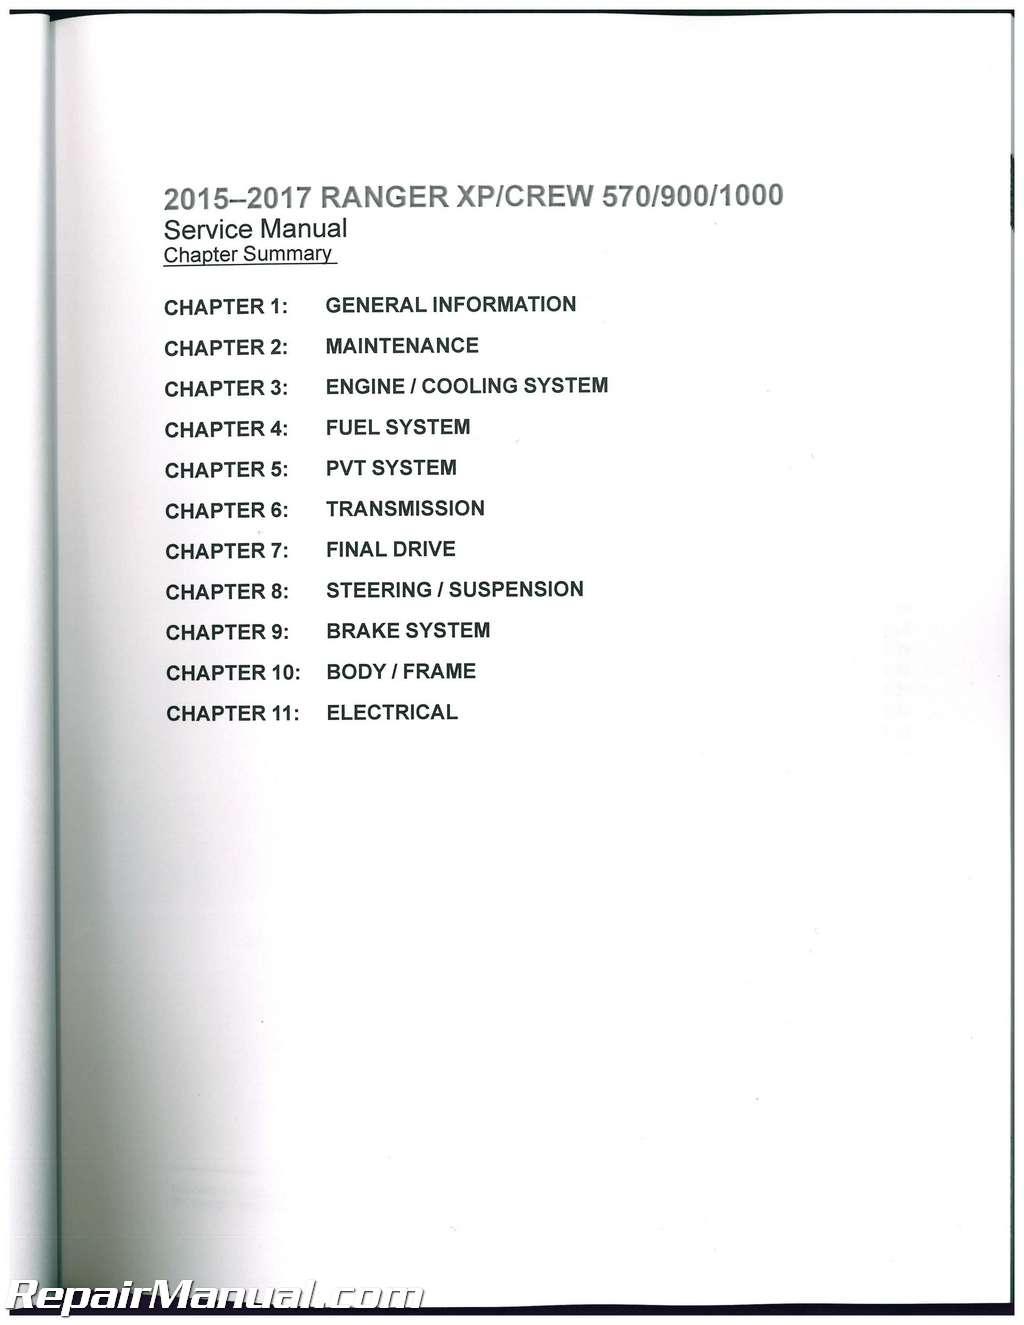 2015 Polaris Ranger 570 >> 2015 2016 2017 Polaris Ranger XP CREW XP 570 900 1000 Side by Side Service Manual